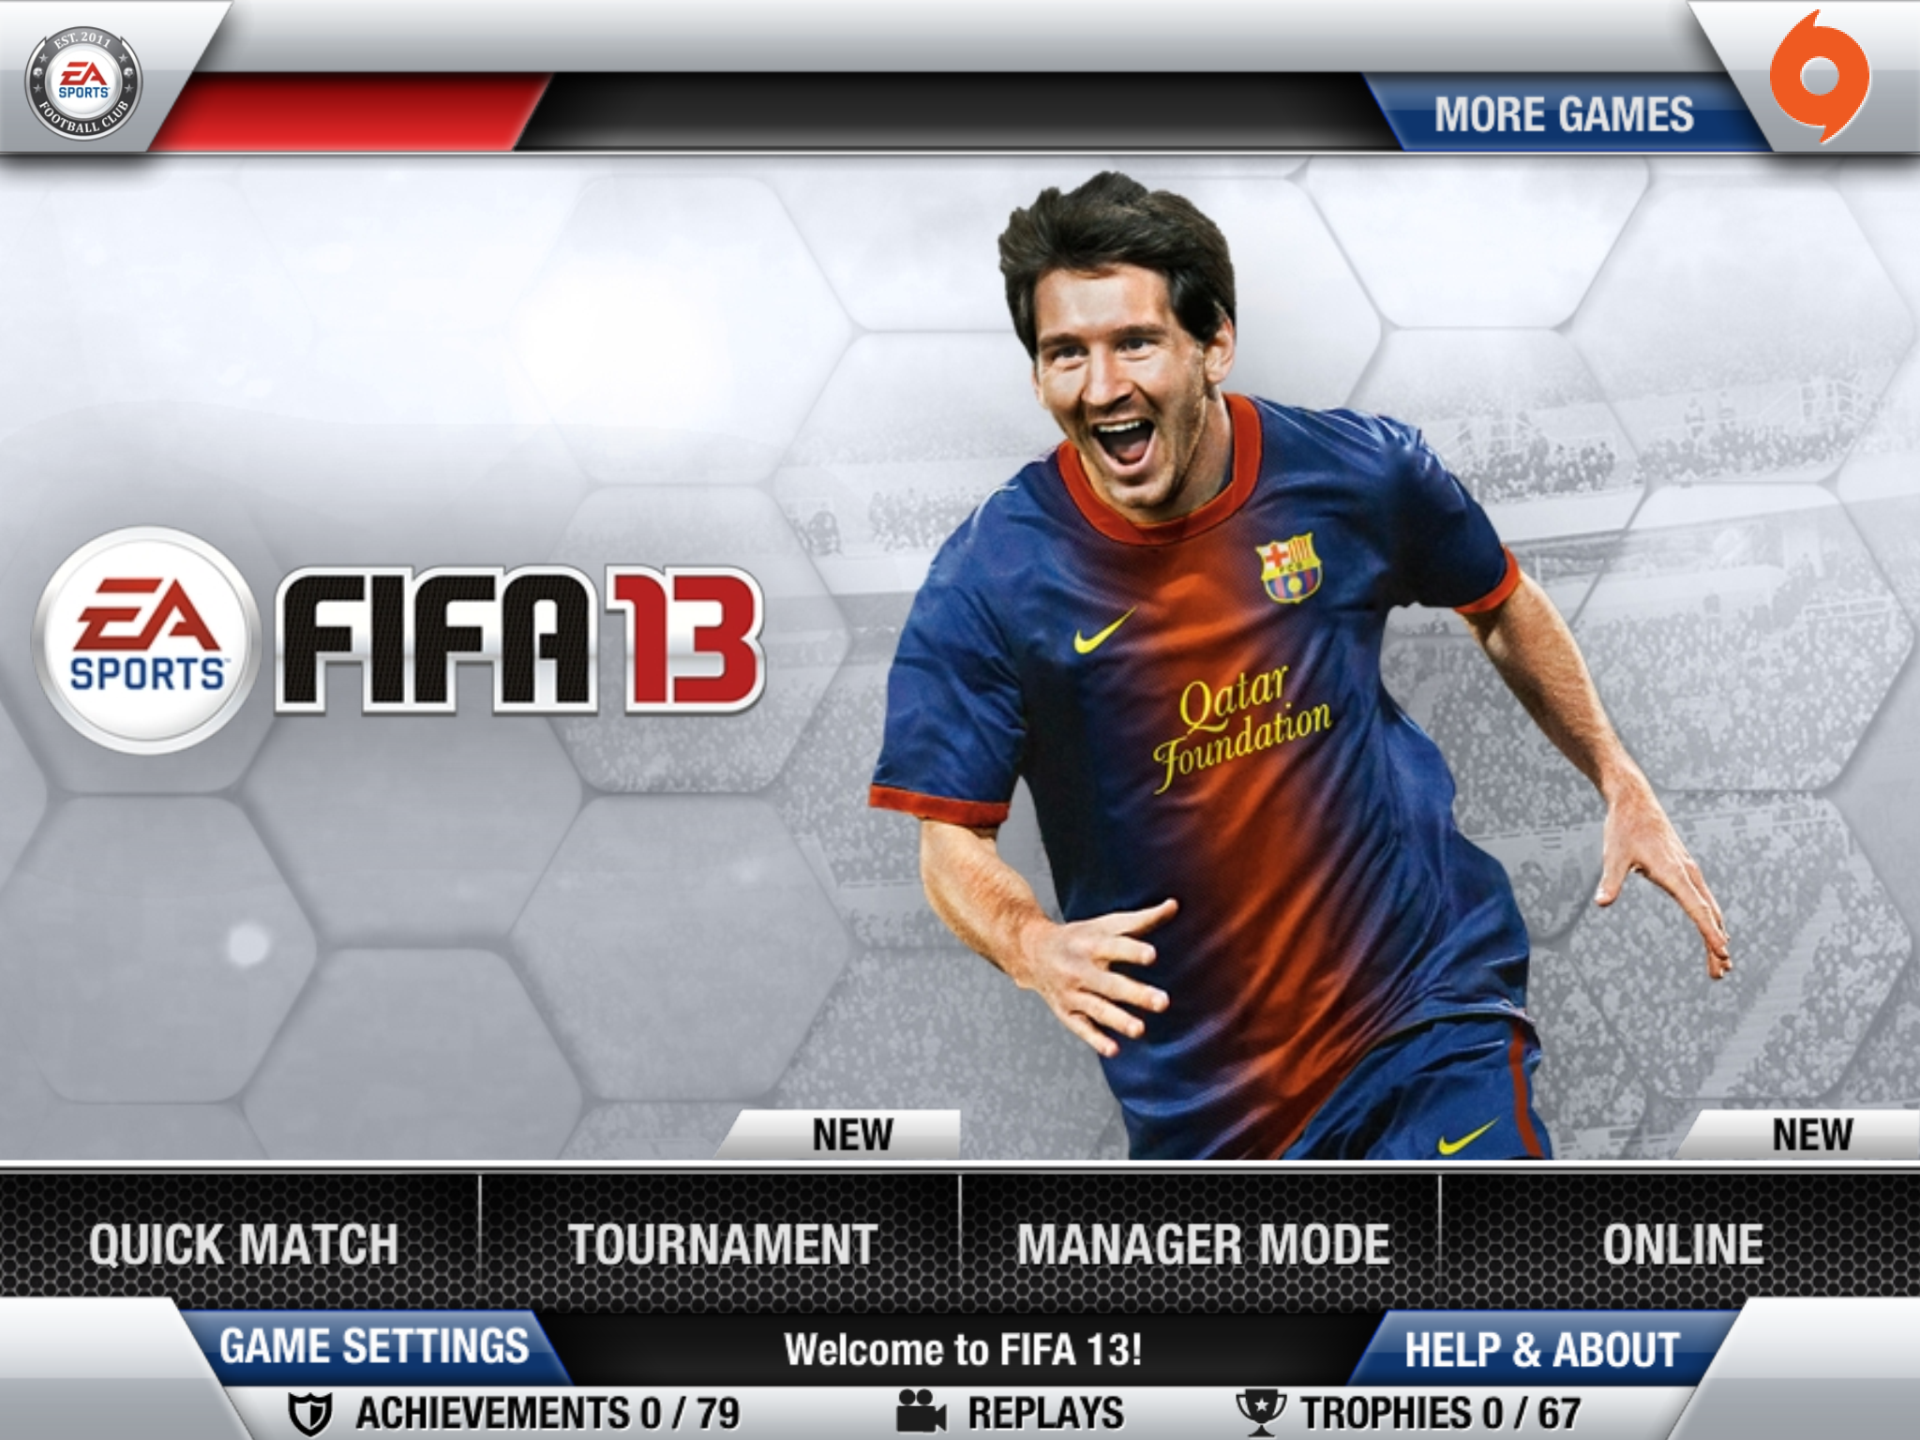 Obrázky z iOS verze FIFA 13 70826